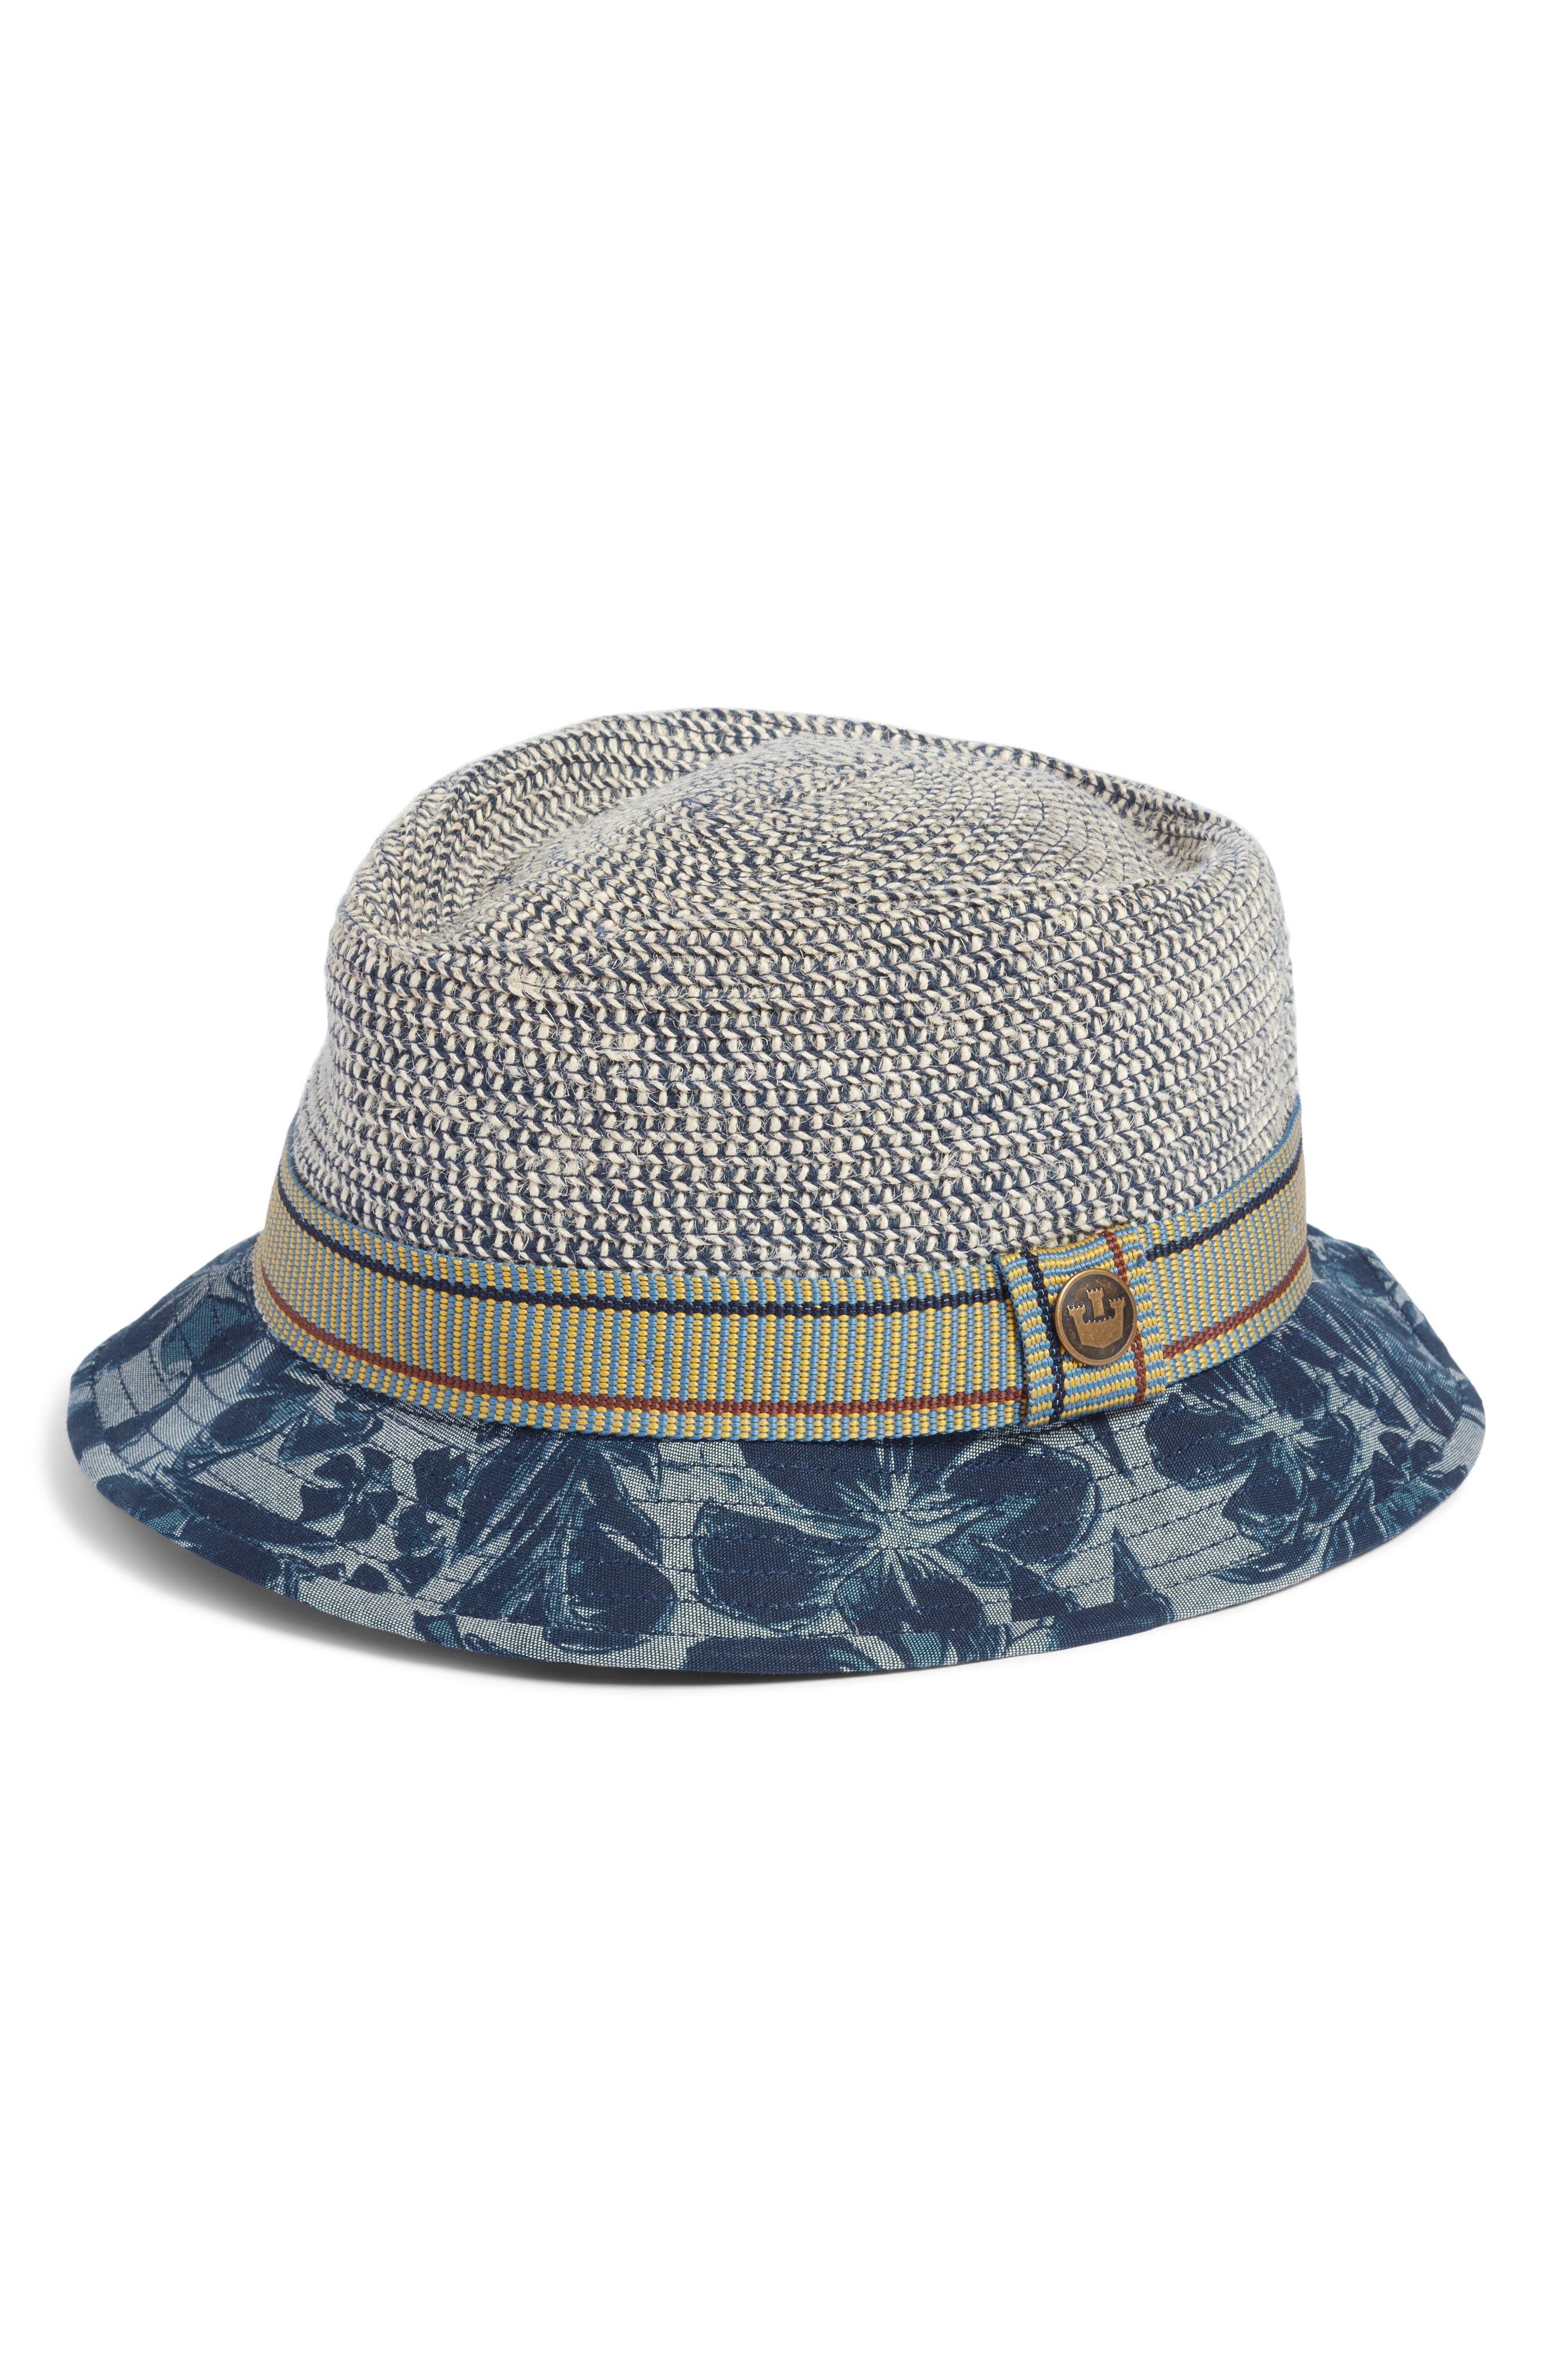 355fa2e0 goorin bros. fedoras hats for men - Buy best men's goorin bros. fedoras hats  on Cools.com Shop